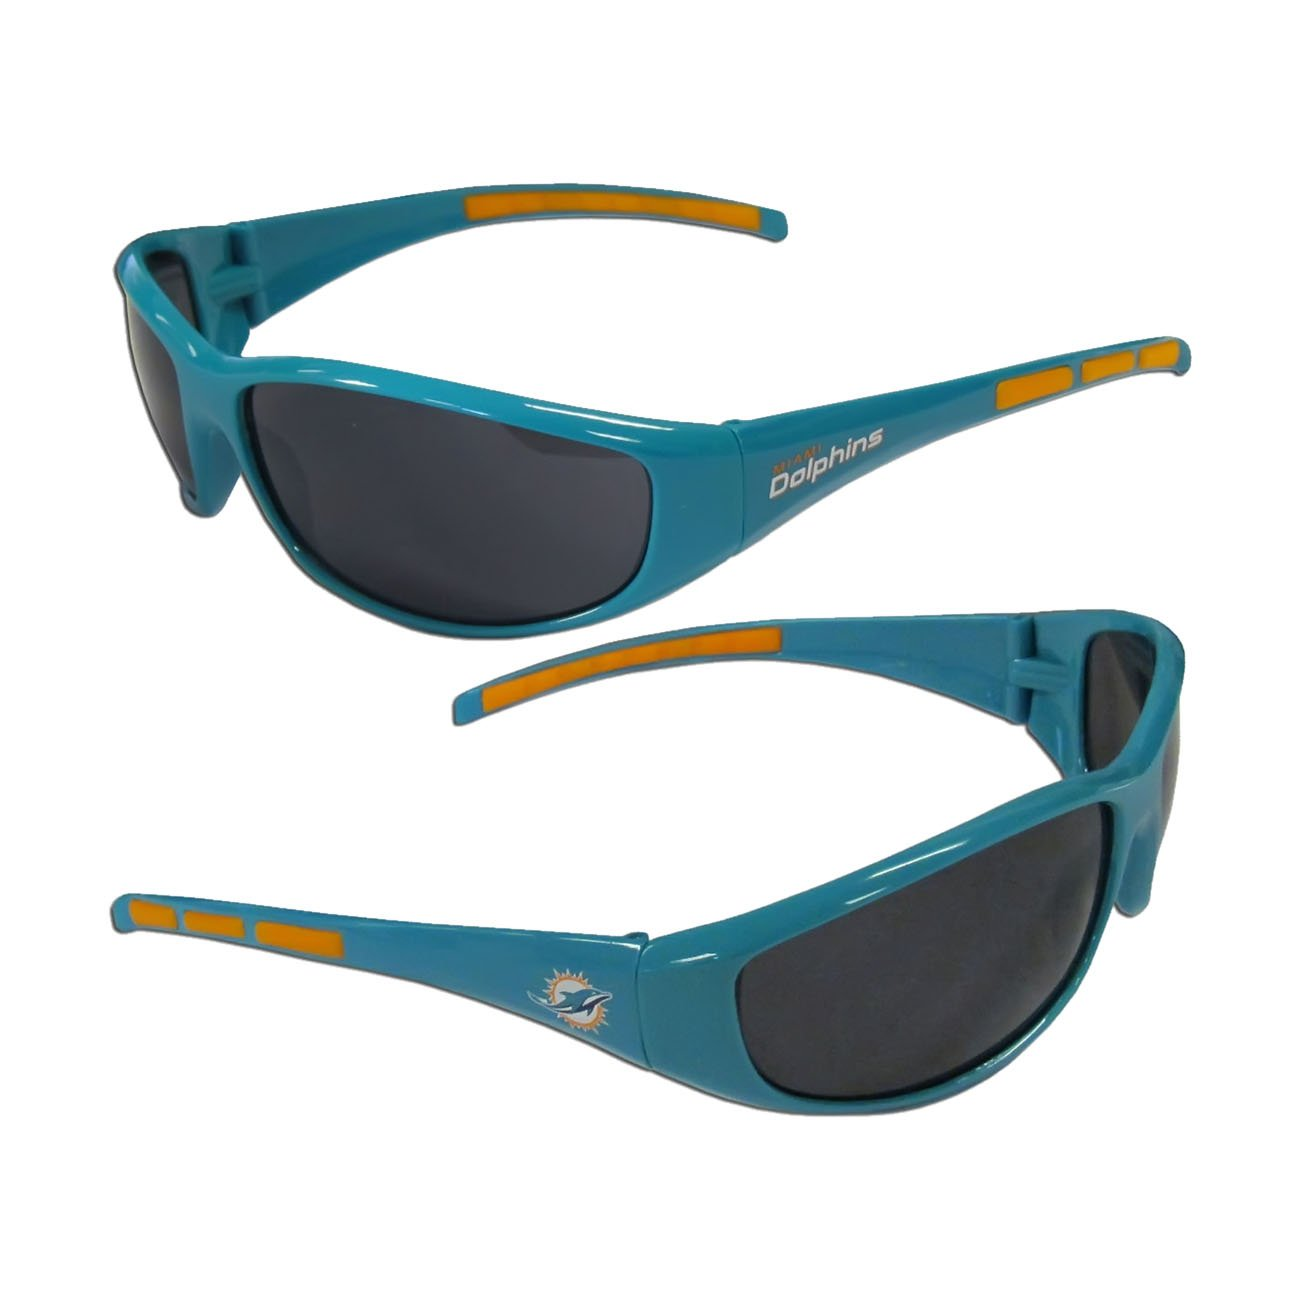 Amazon.com: NFL Wrap estilo anteojos de sol, talla única Se ...